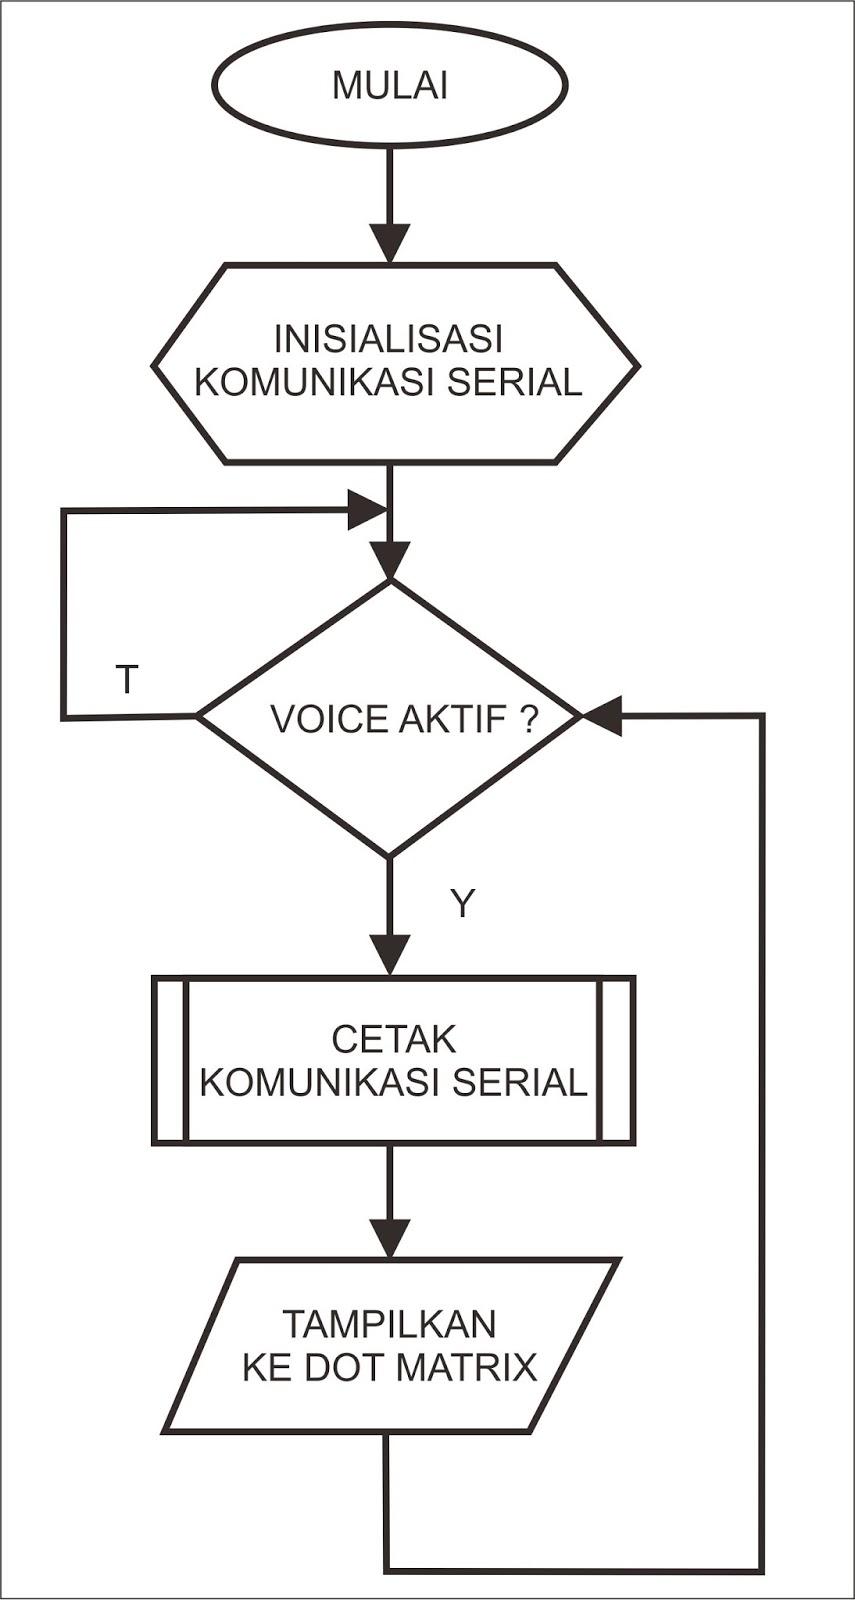 belajar mikrokontroler 2016  dot matriks penampil pesan suara